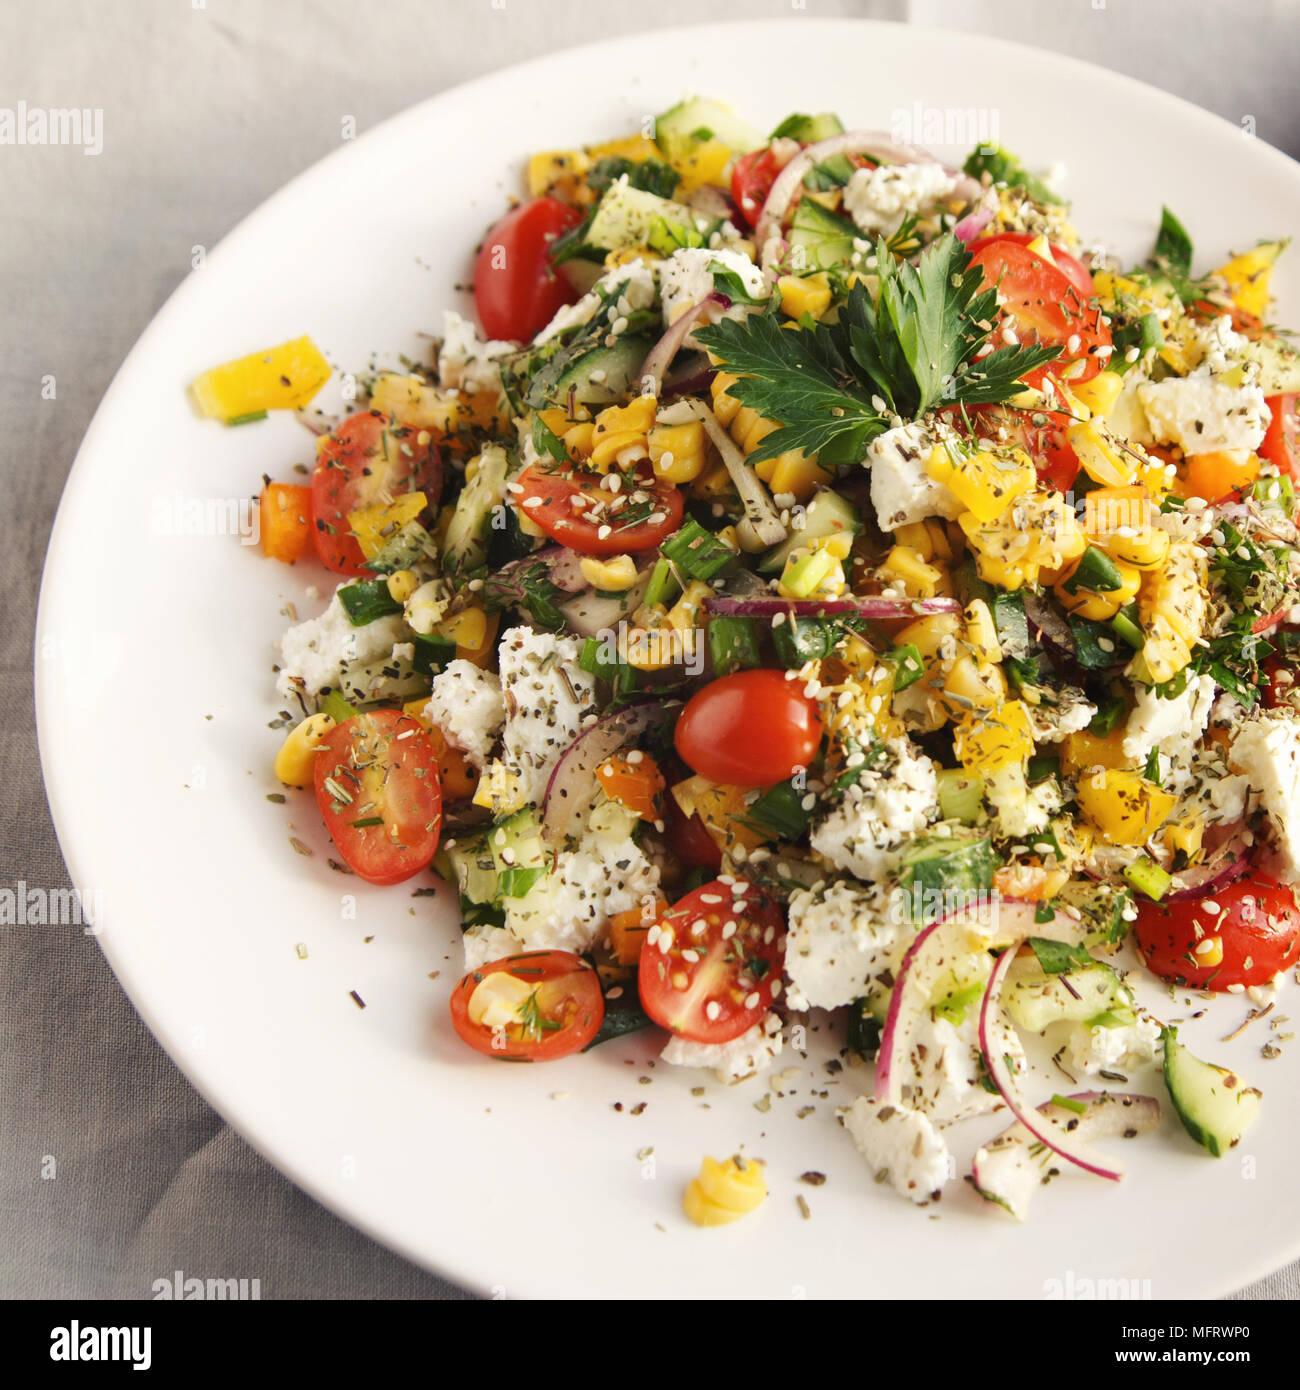 Strange Colorful Vegetable Mix Simple Low Calories Salad Cherry Interior Design Ideas Clesiryabchikinfo